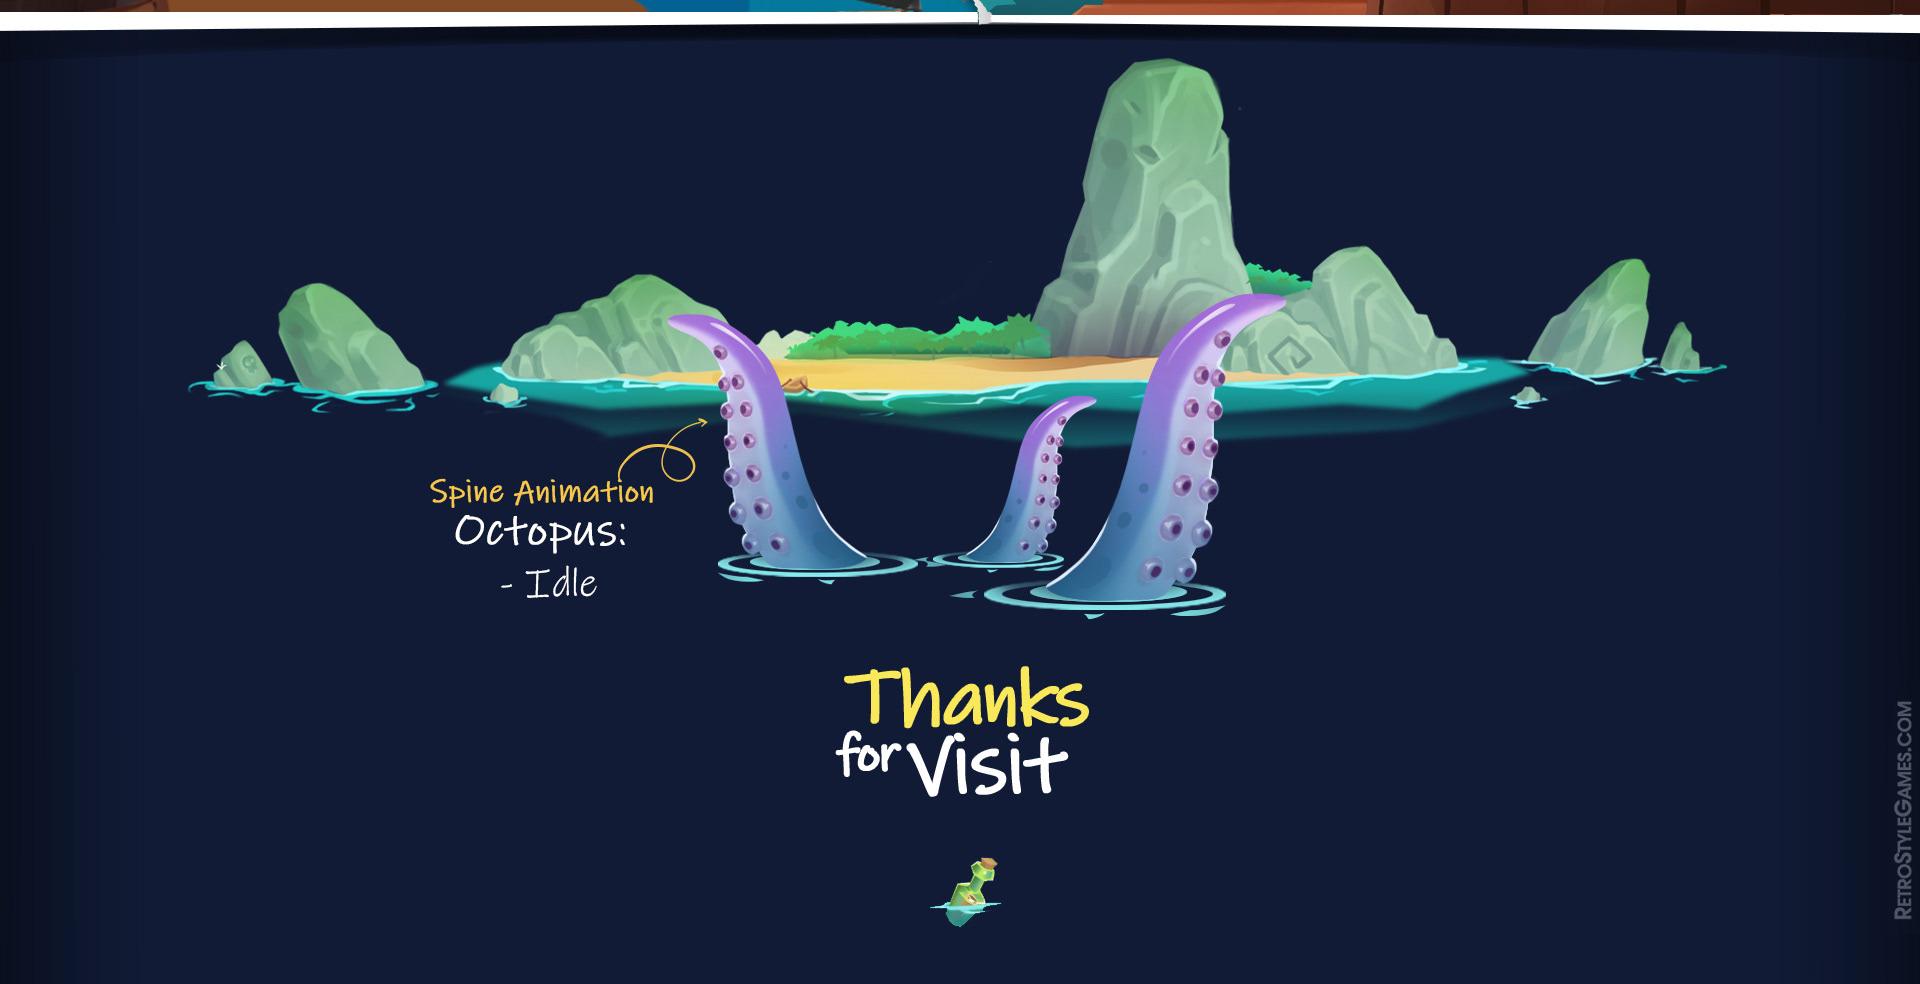 Pirate Beat'em Up - Spine 2D Animation Unity Assets on Behance